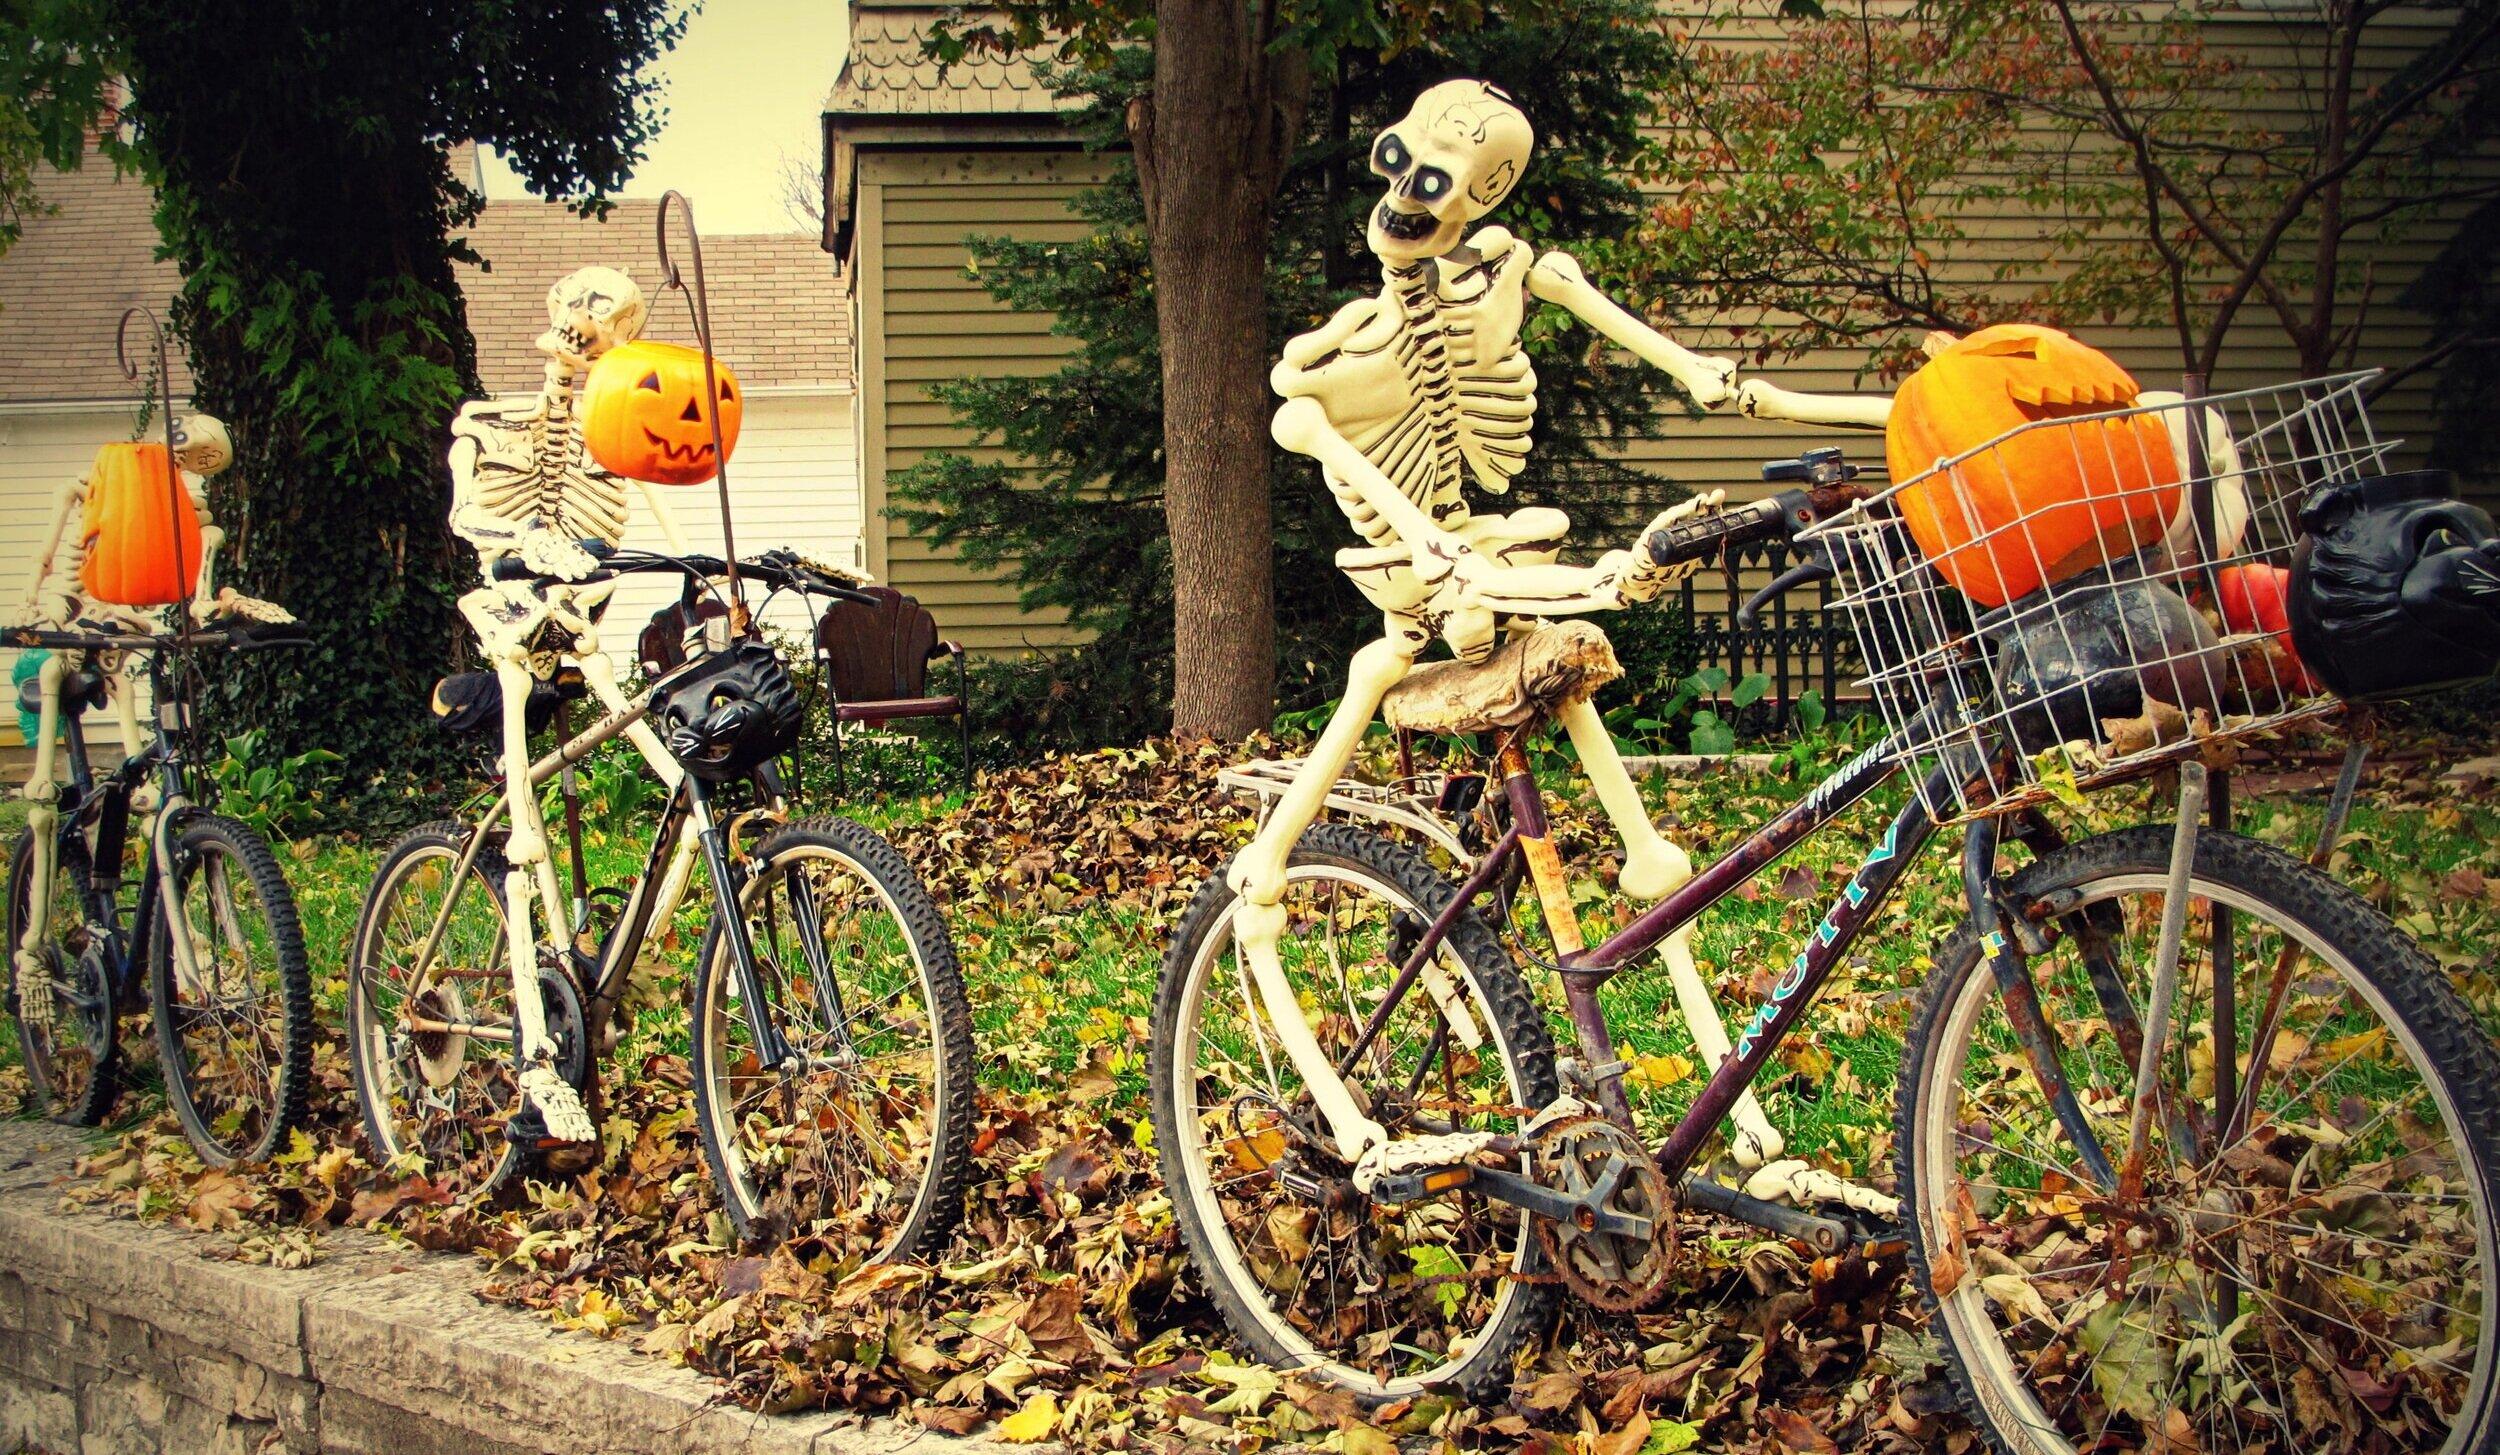 skeleton-riders-state-street-alton-ill-2012.jpg